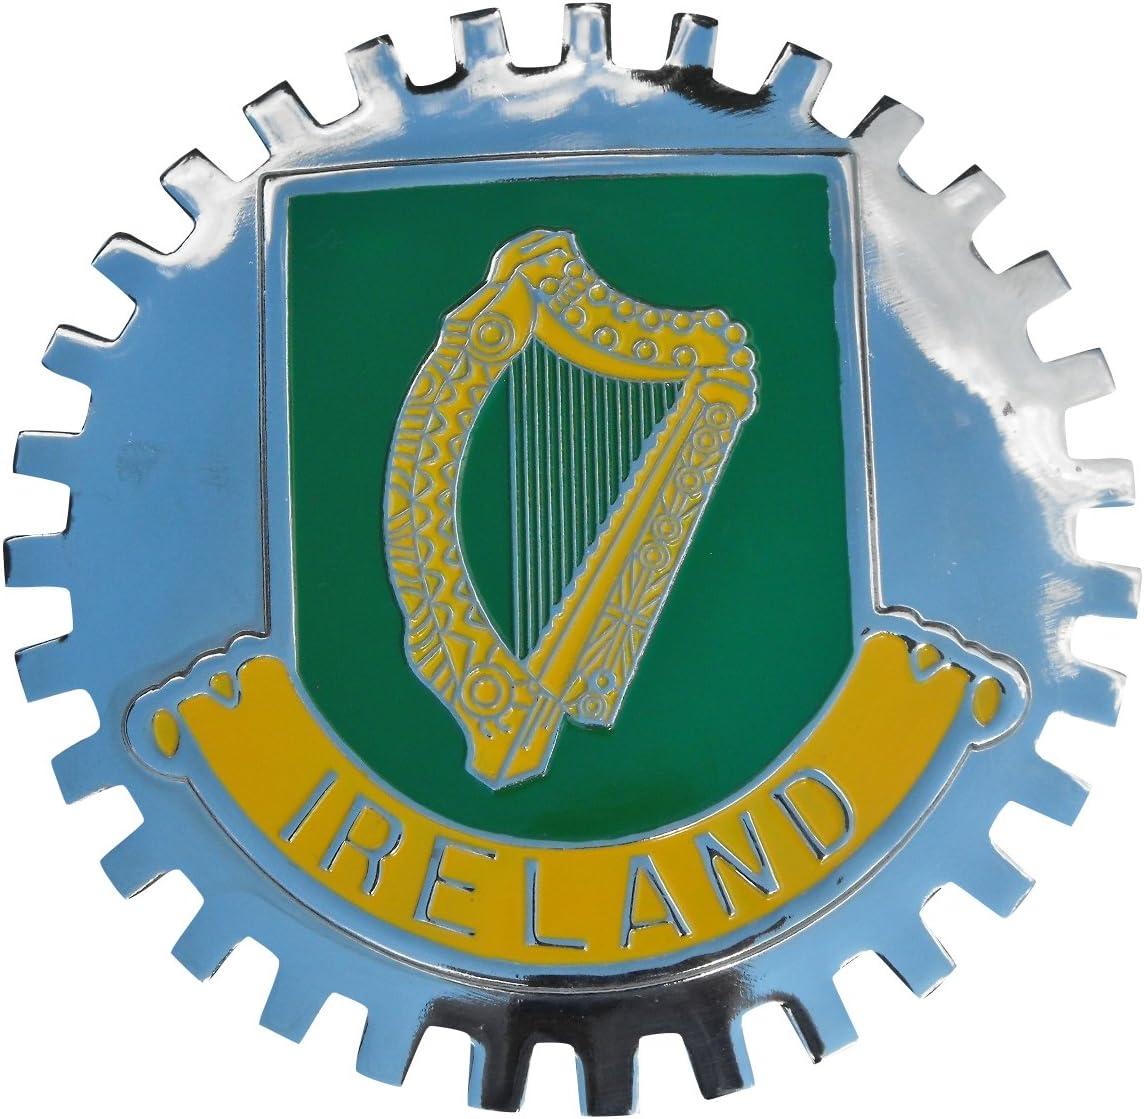 HARP IRELAND CAR GRILLE EMBLEM BADGES